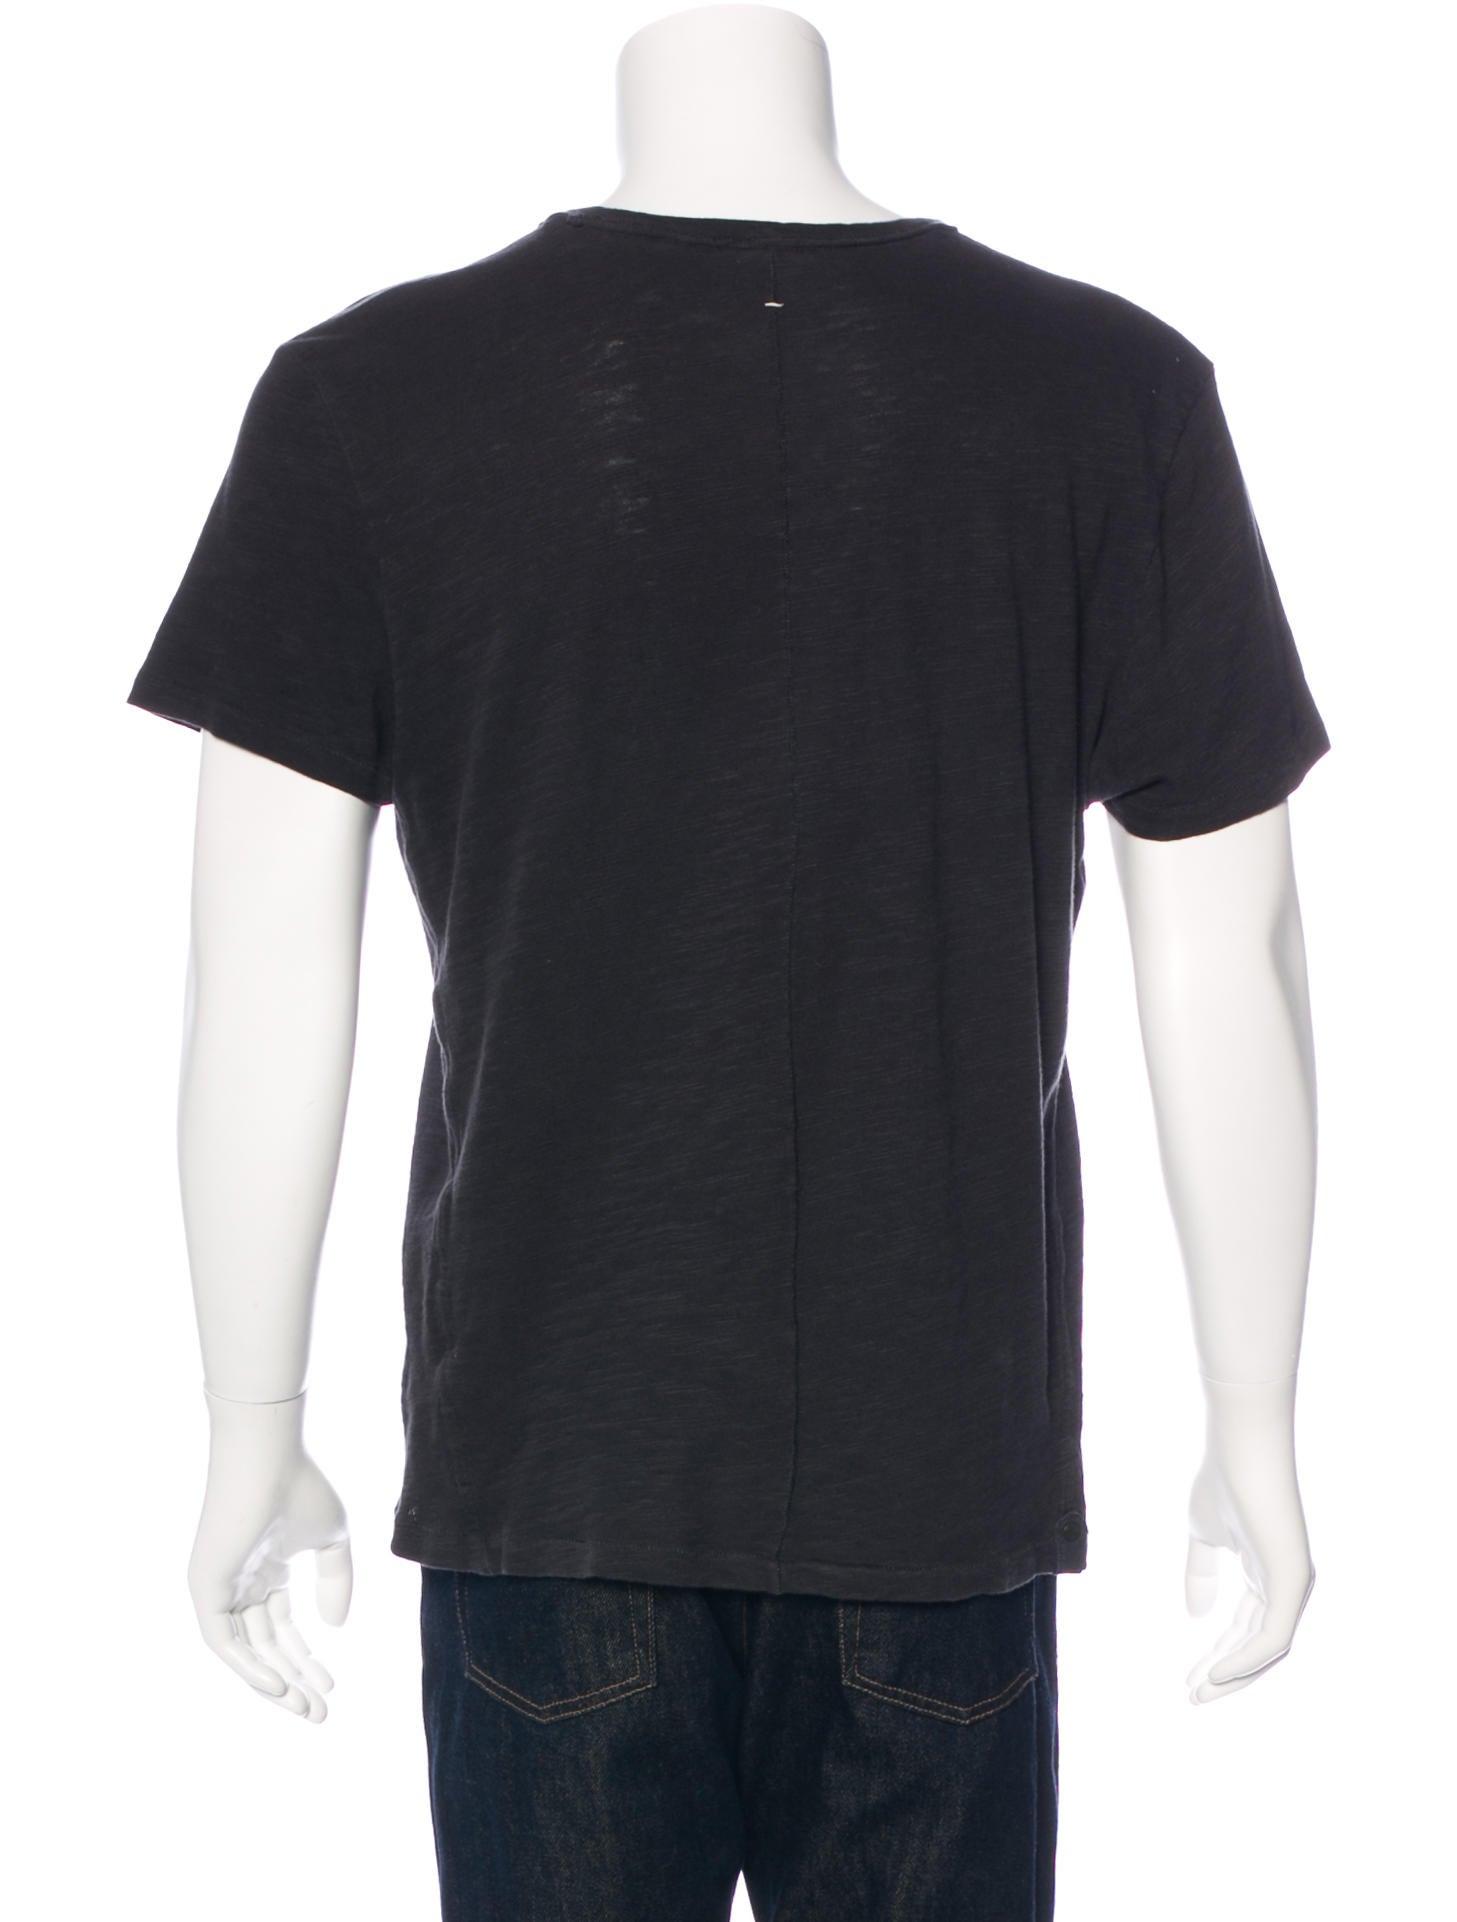 Rag Bone Crew Neck T Shirt Clothing Wragb69482 The